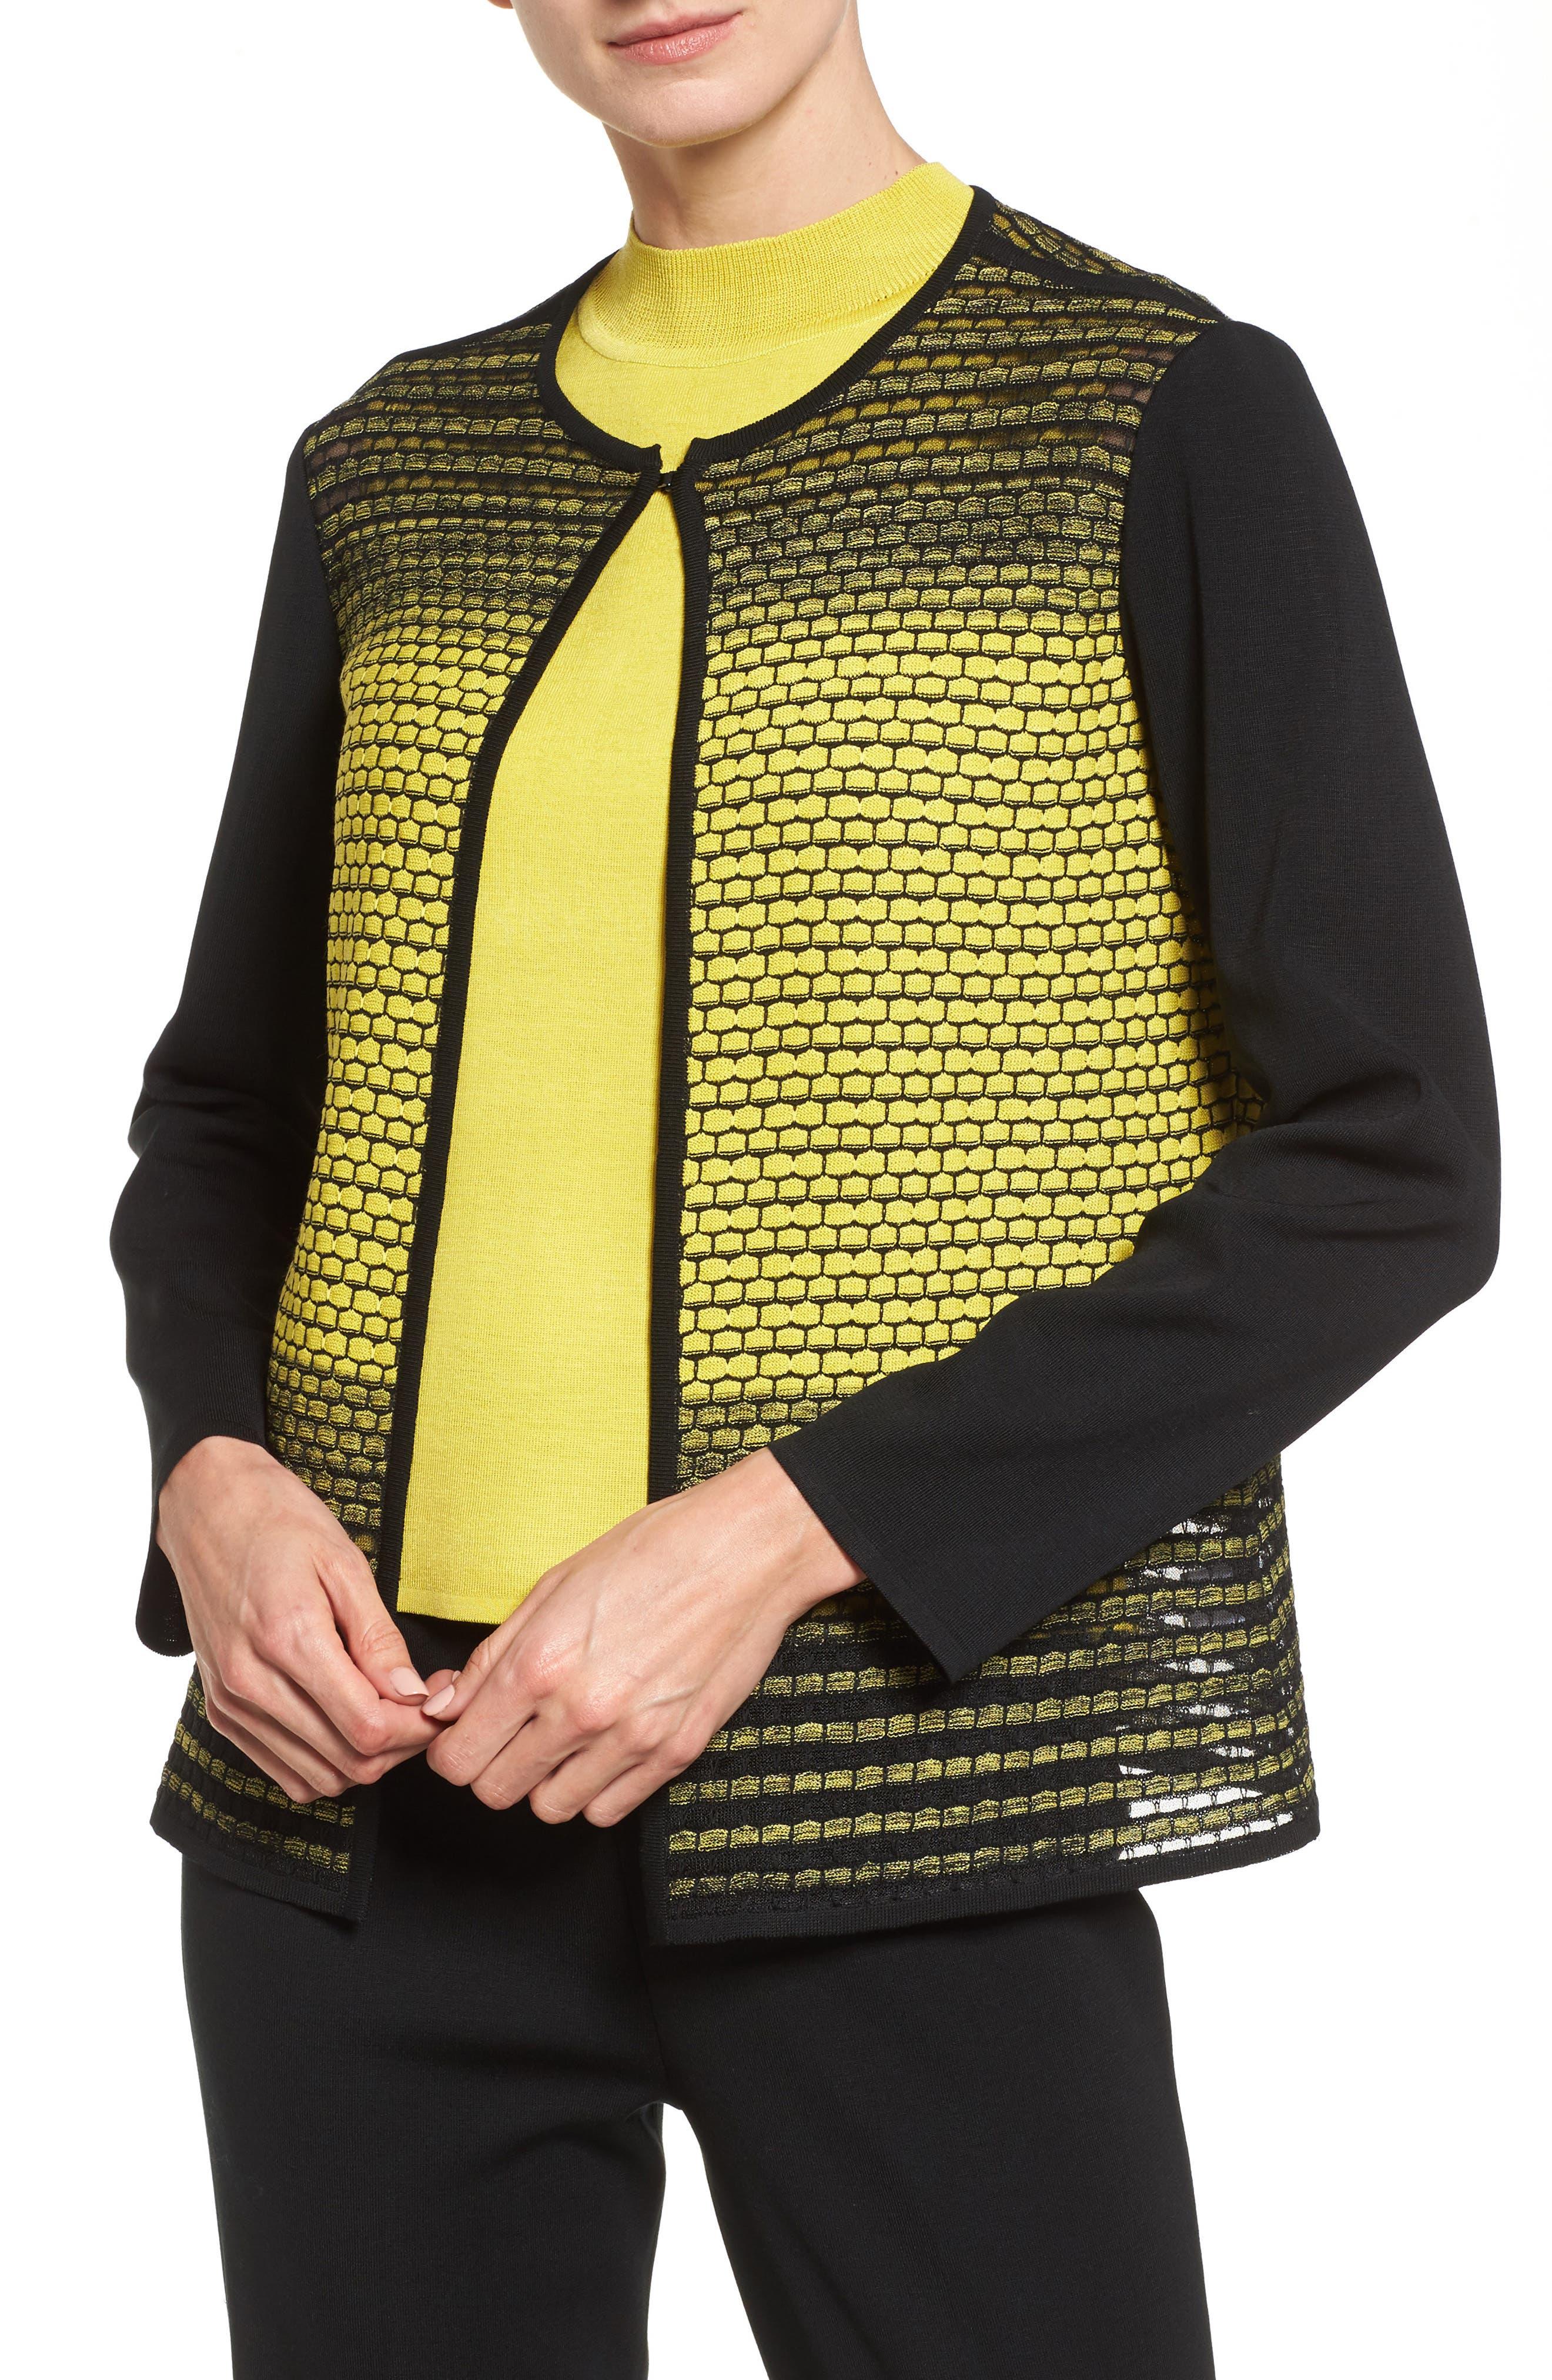 Alternate Image 1 Selected - Ming Wang Colorblock Knit Jacket